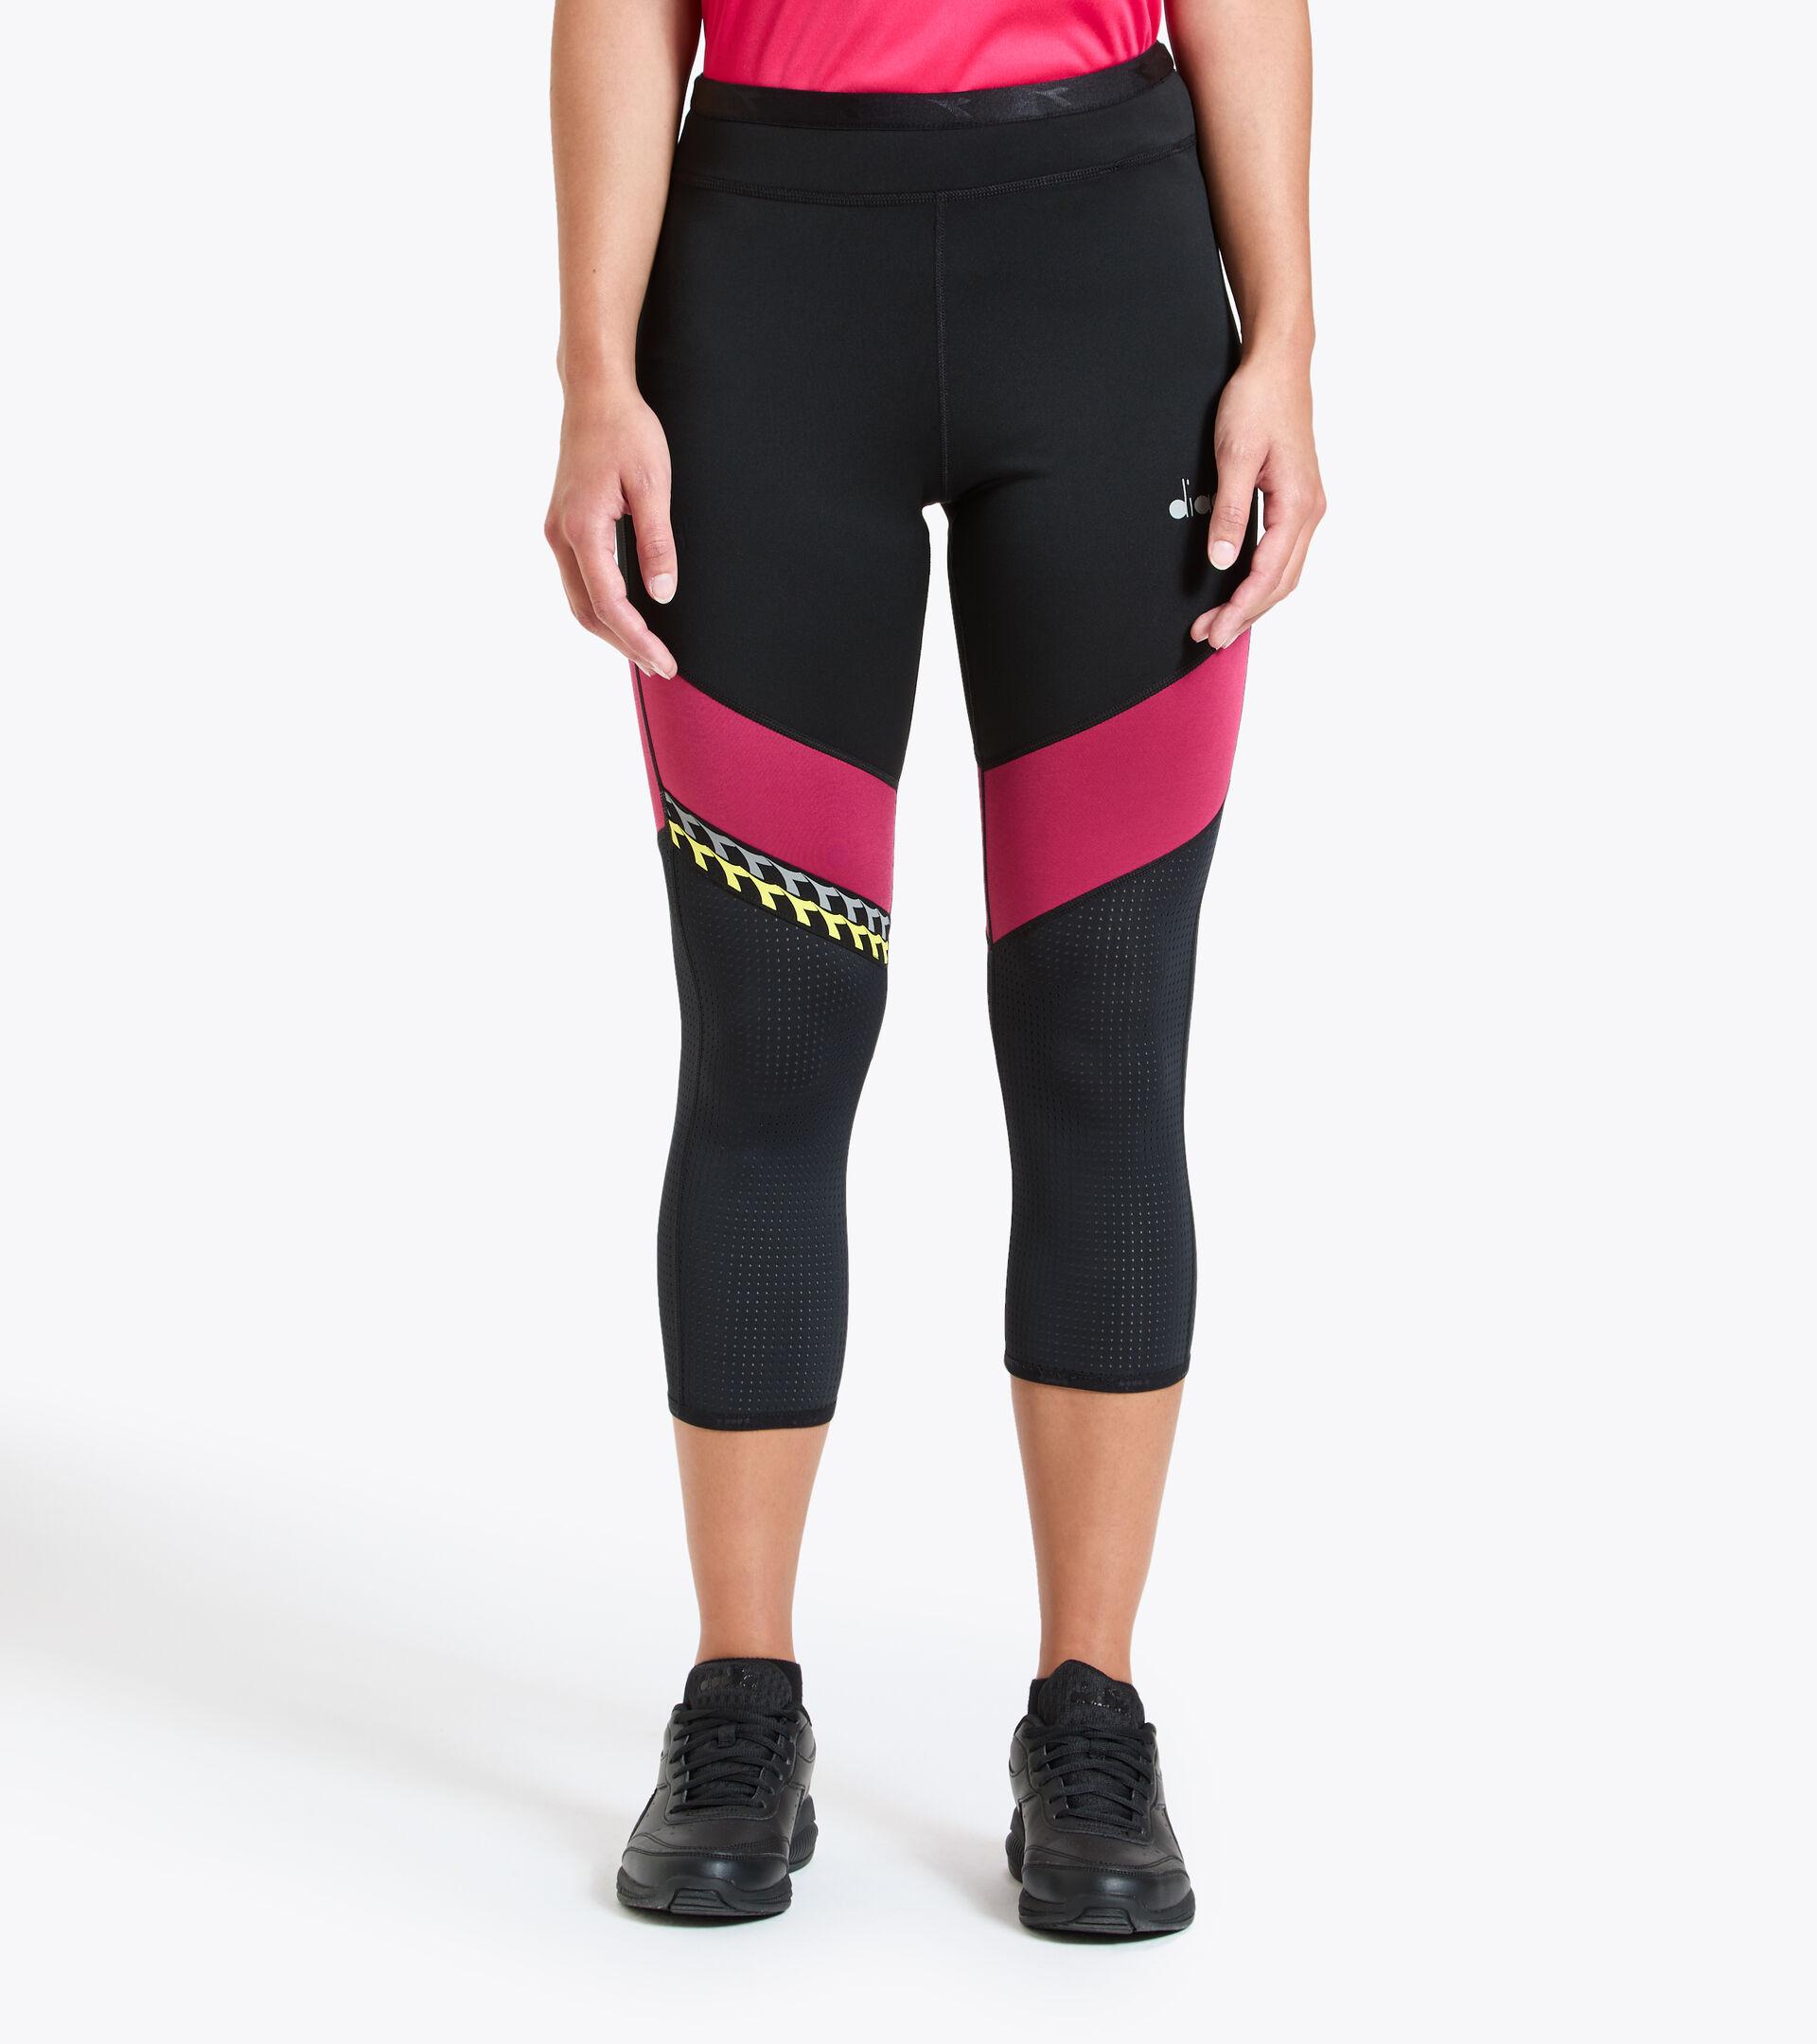 Leggings da running - Donna L. 6/8 REVERSIBLE TIGHTS BE ONE NERO - Diadora